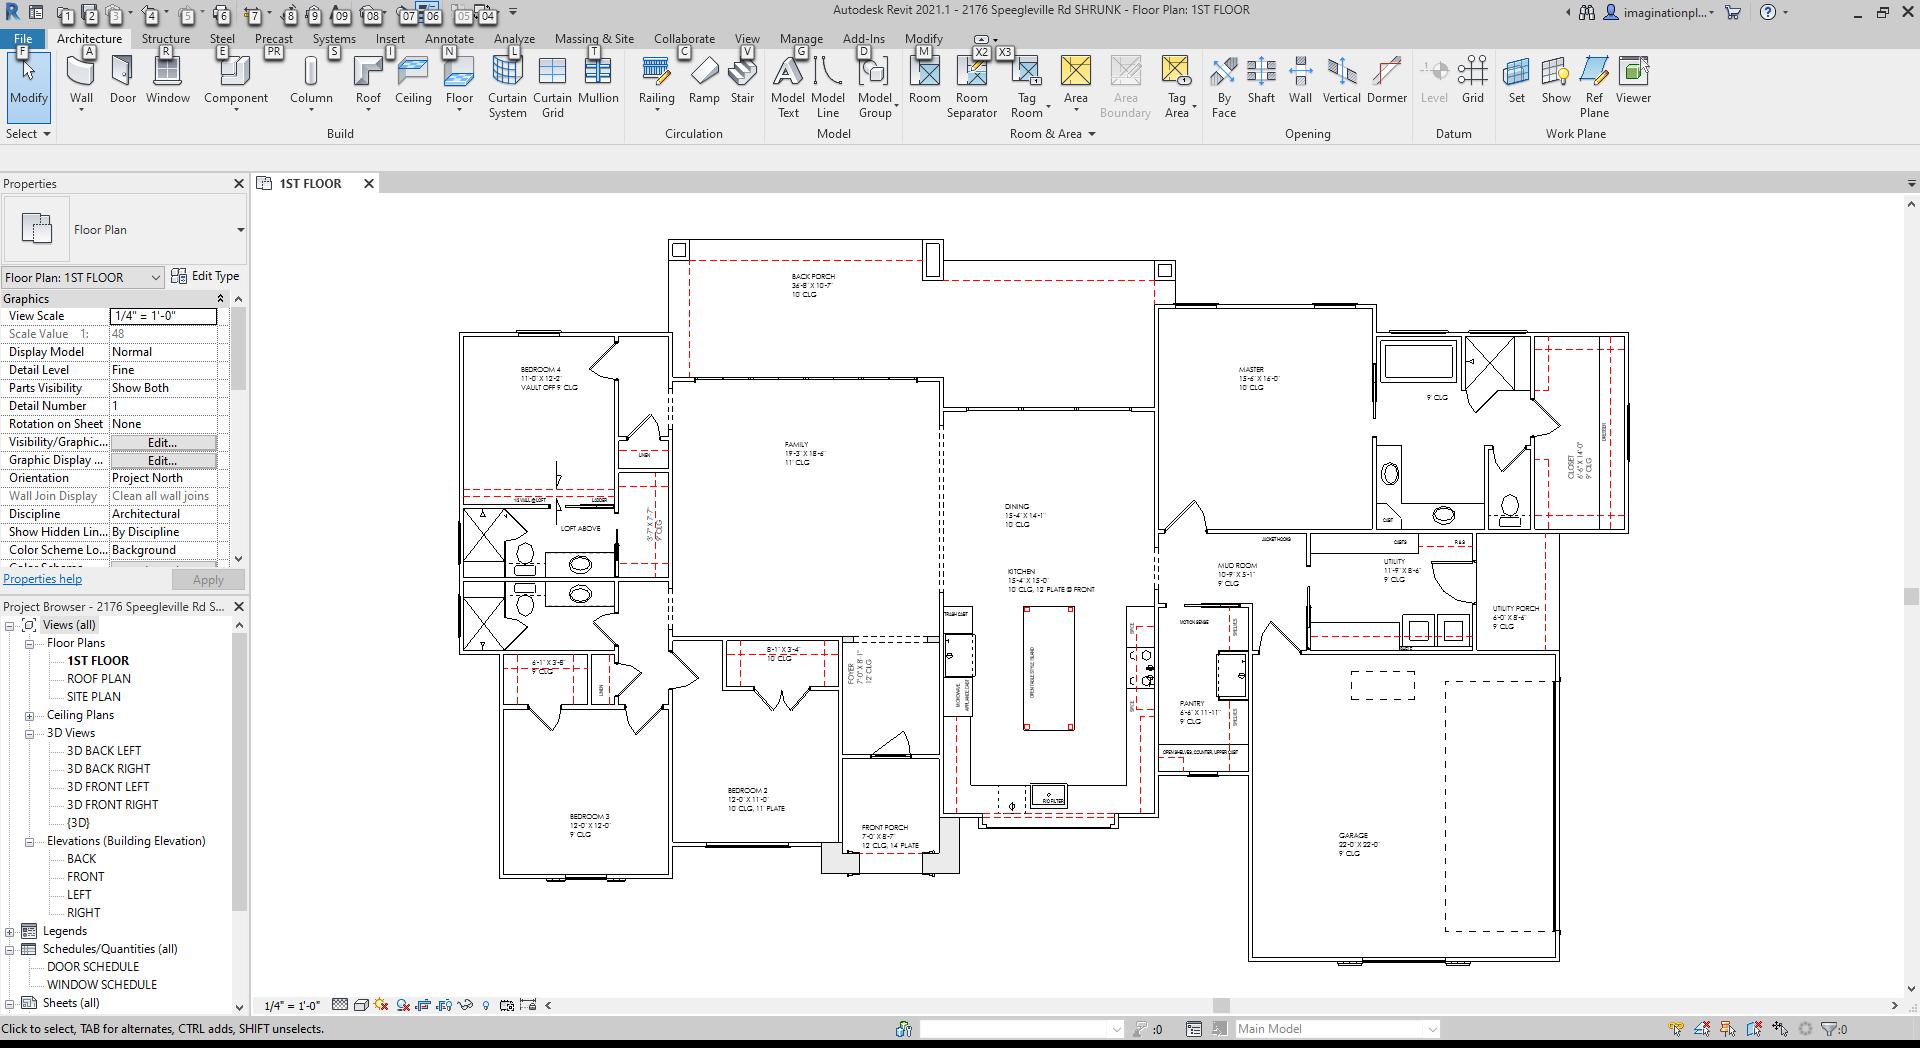 Autodesk Revit 2021.1 - [LG 2 story 1 do